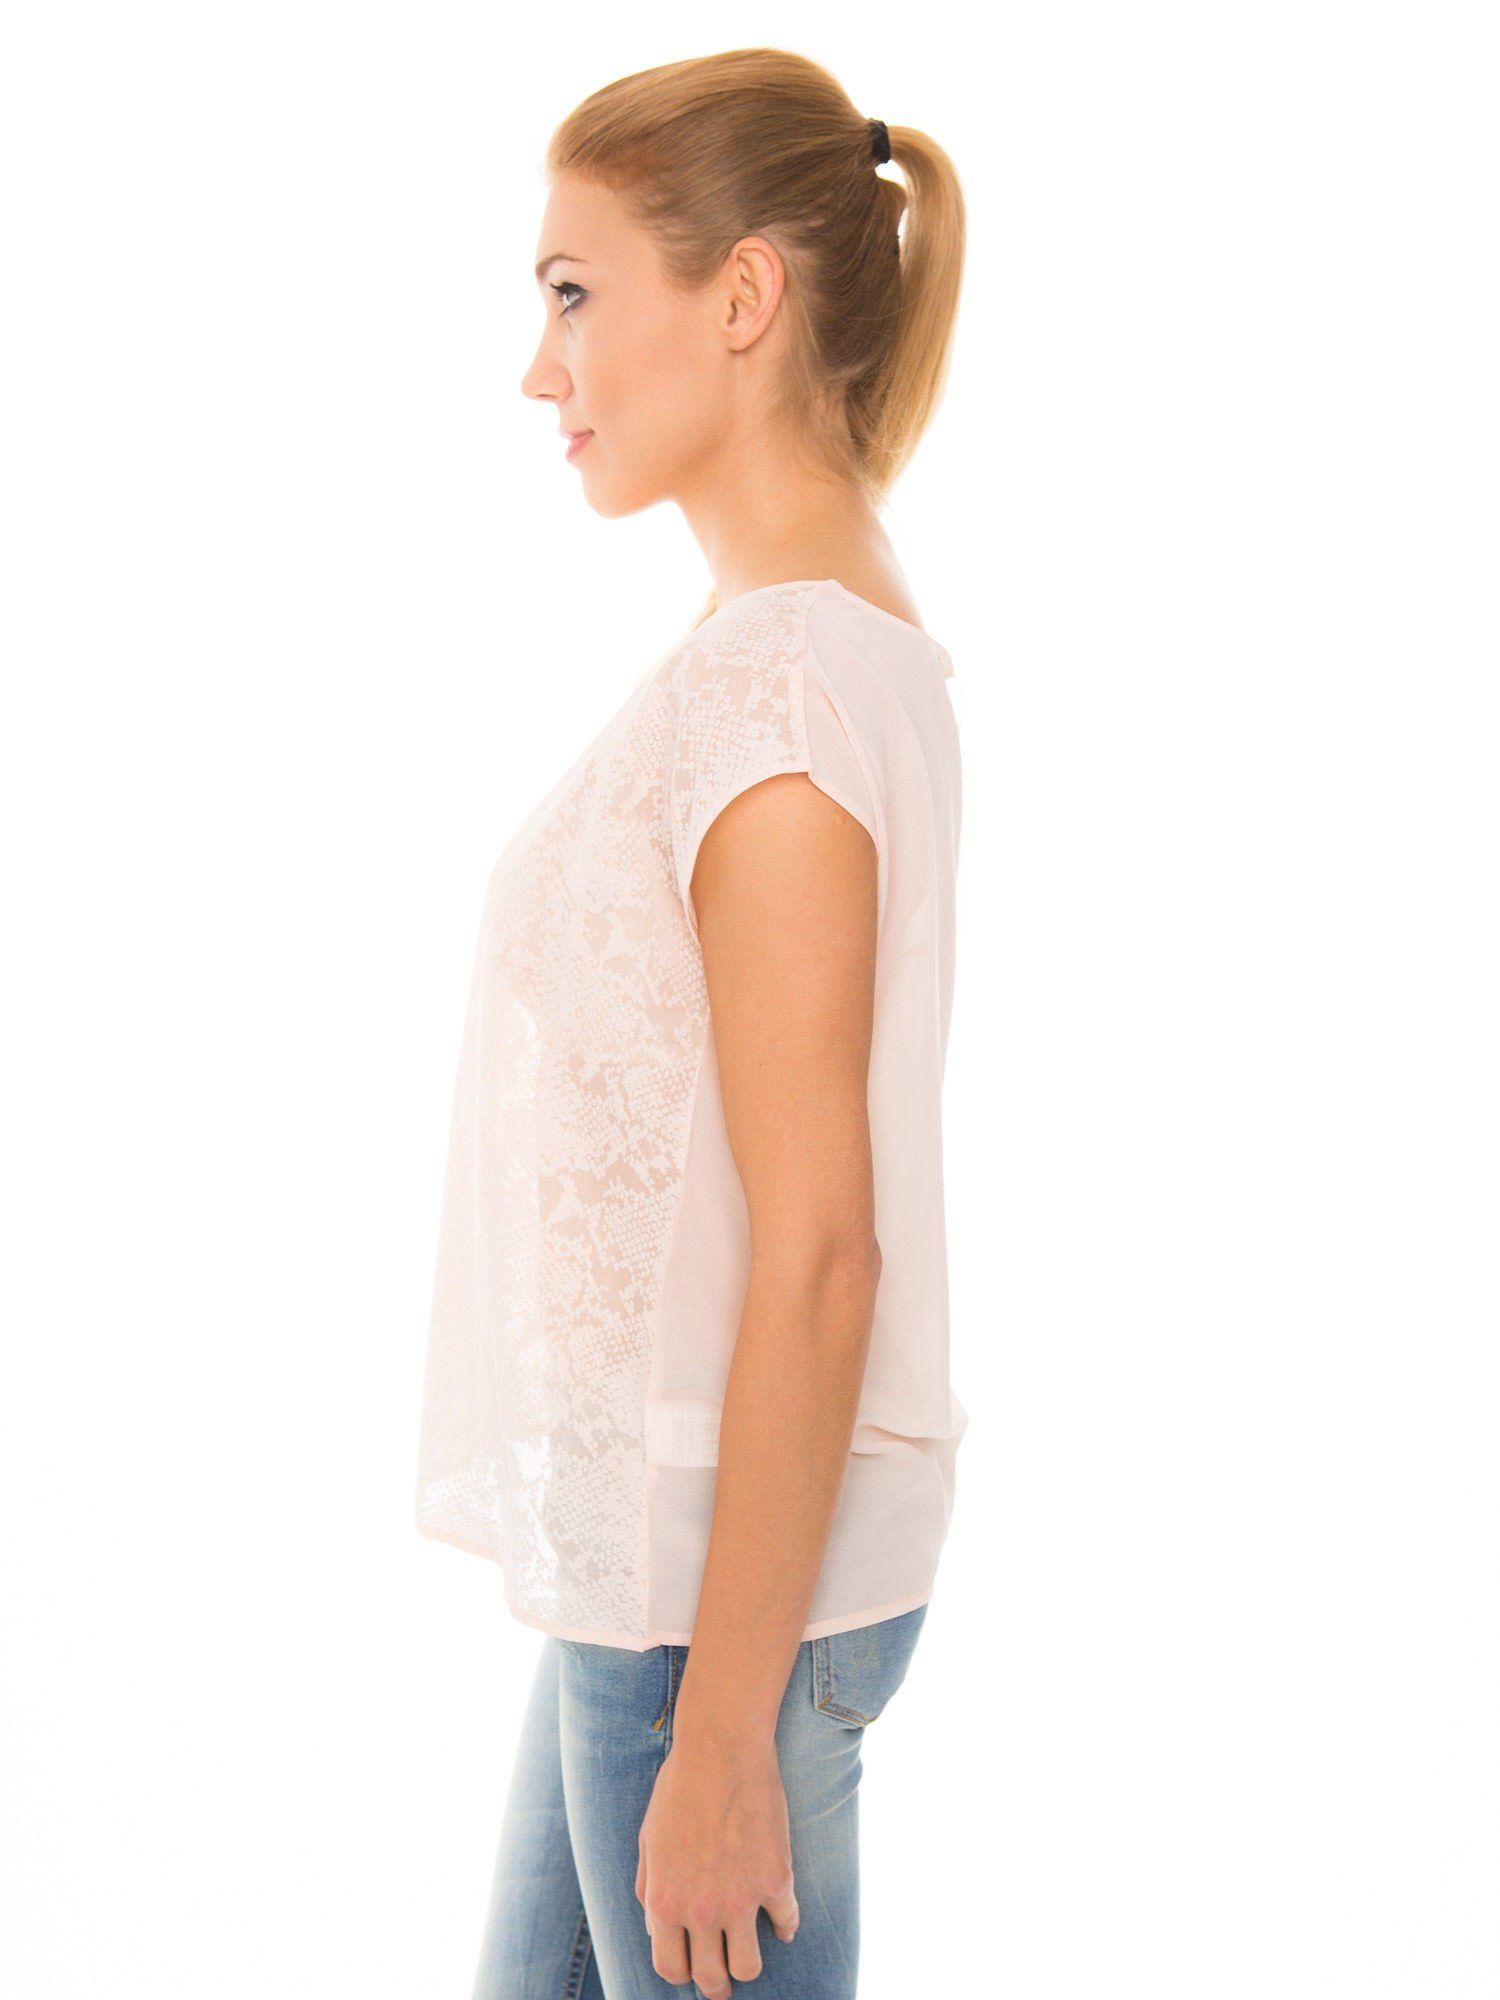 Koralowa transparentna koszula                                  zdj.                                  6